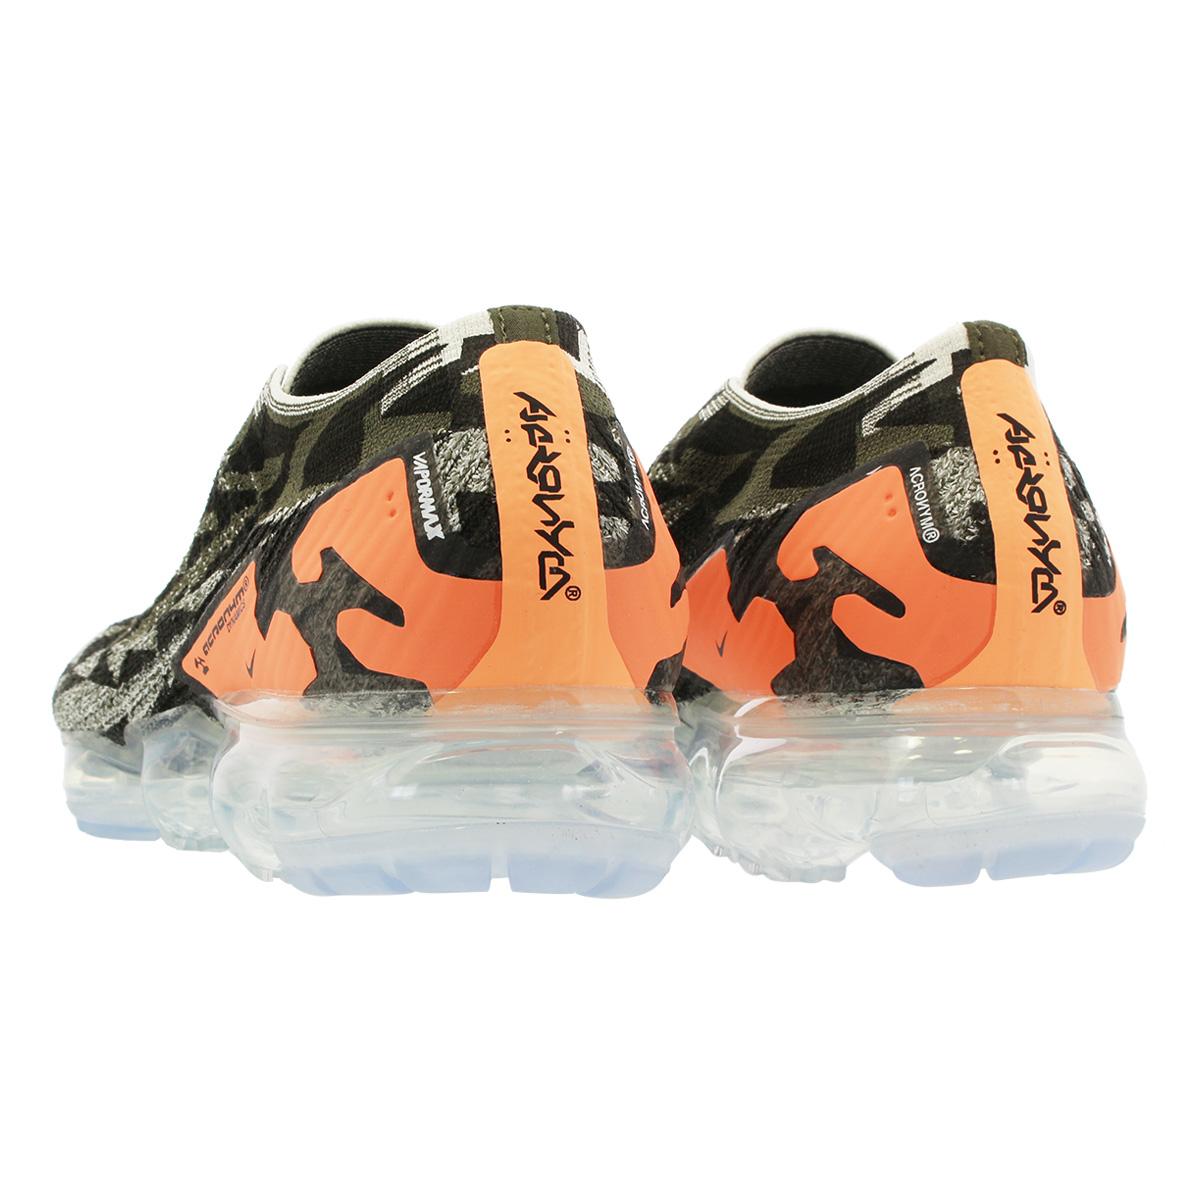 c6c03a013ad0 NIKE X ACRONYM AIR VAPORMAX MOC 2 Nike X アクロニウムエアヴェイパーマックスモック 2 SAIL CARGO  KHAKI DARK STUCCO aq0996-102-l